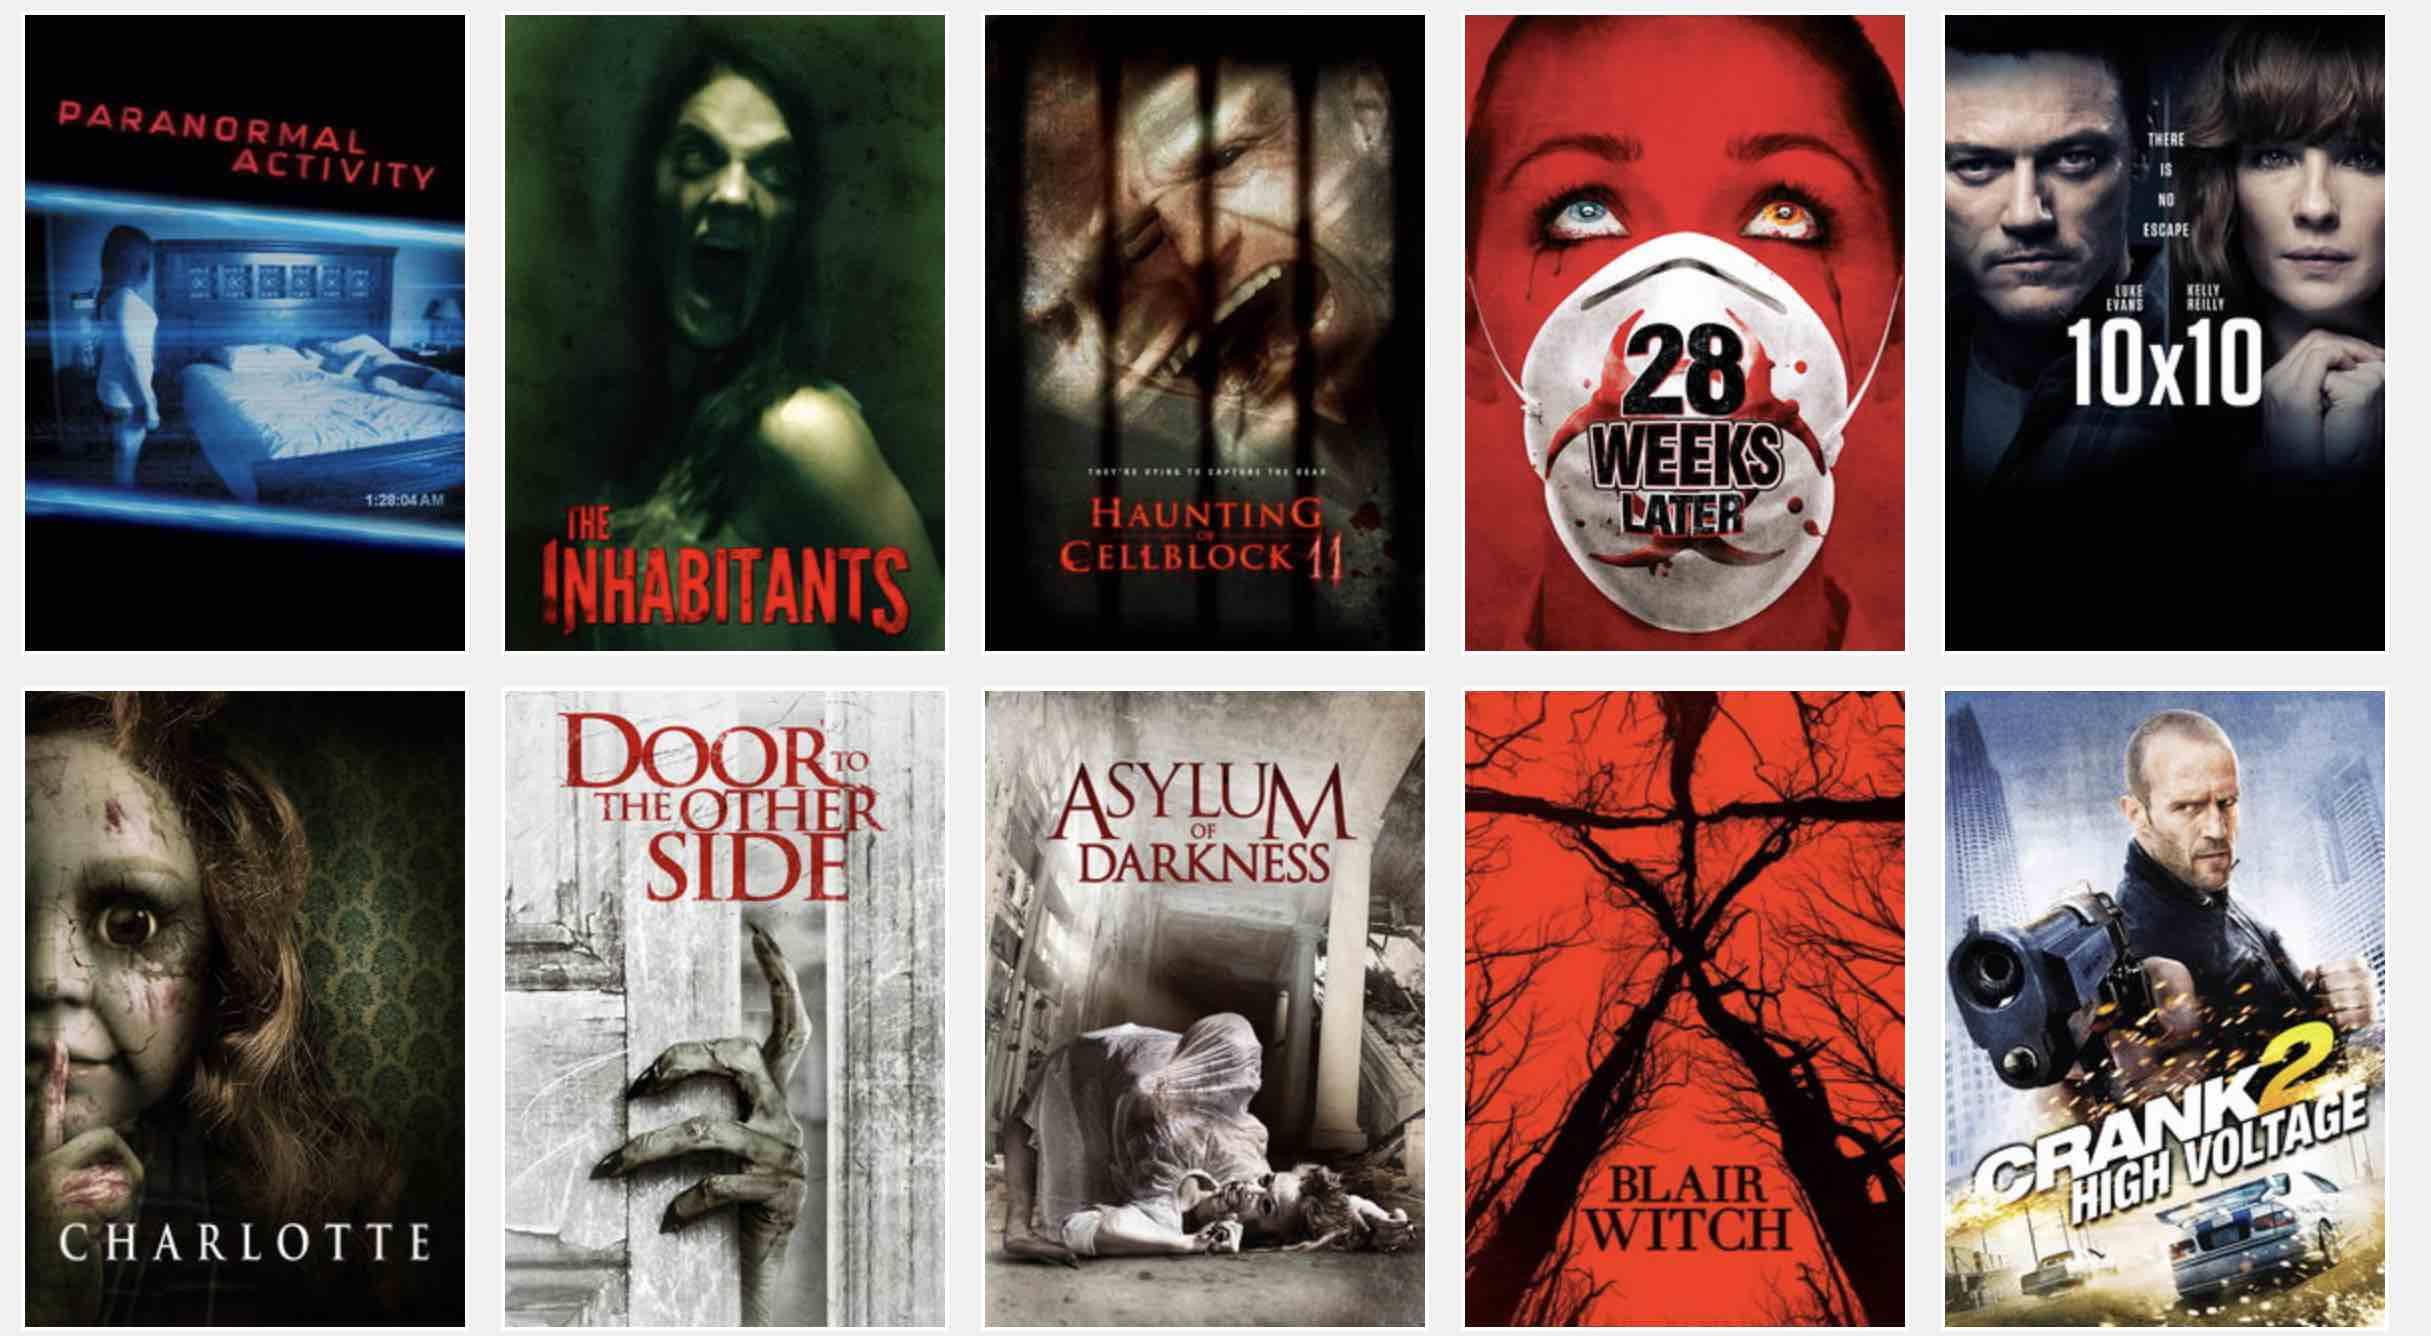 halloween movies list 2018 (streaming on netflix, hulu & amazon prime)